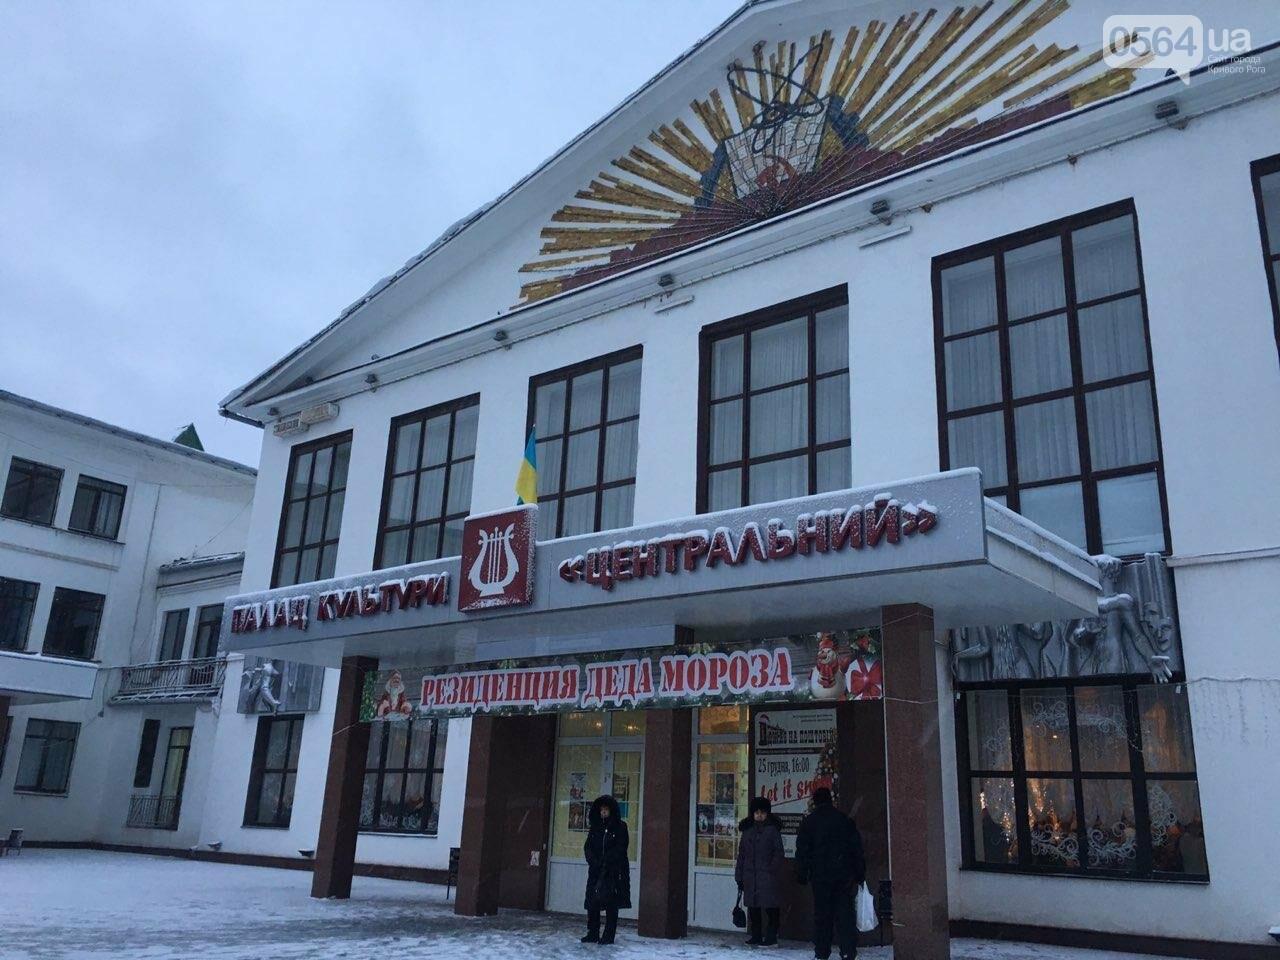 """Let it Snow"": на первое Рождество в Кривом Роге играют джаз, - ФОТО, ВИДЕО, фото-11"